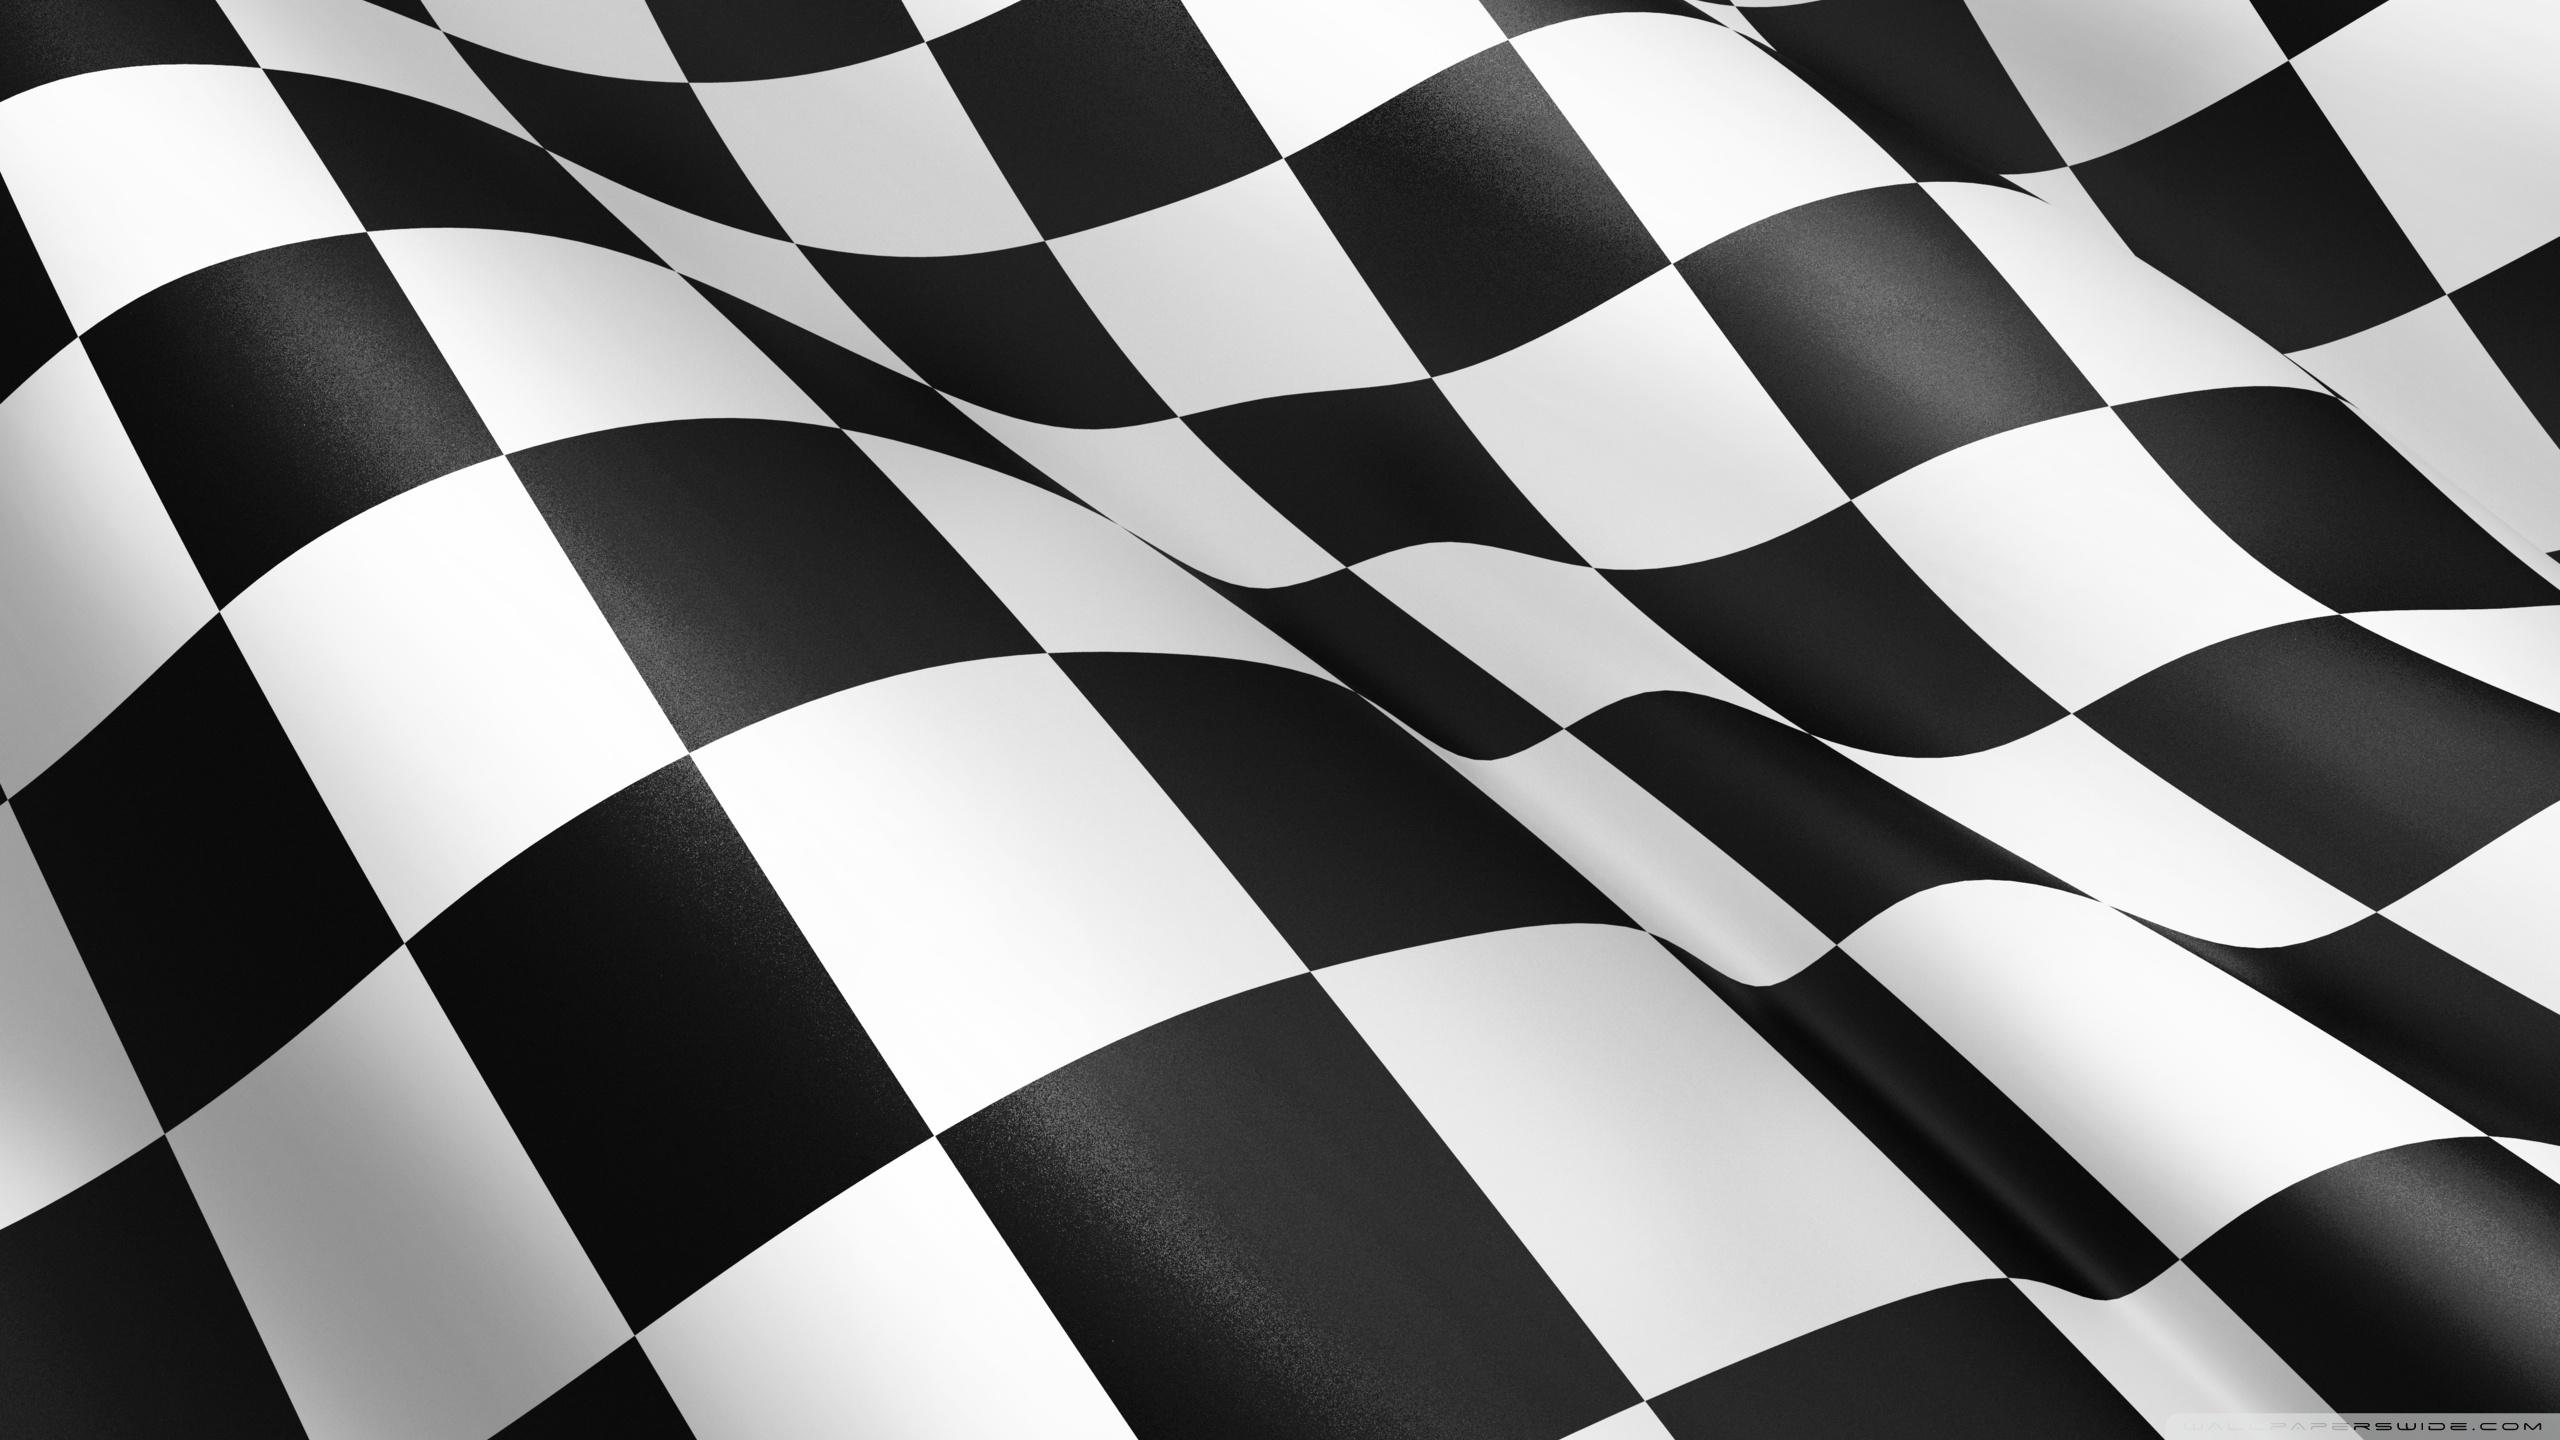 Racing Flag 4K HD Desktop Wallpaper for 4K Ultra HD TV Dual 2560x1440